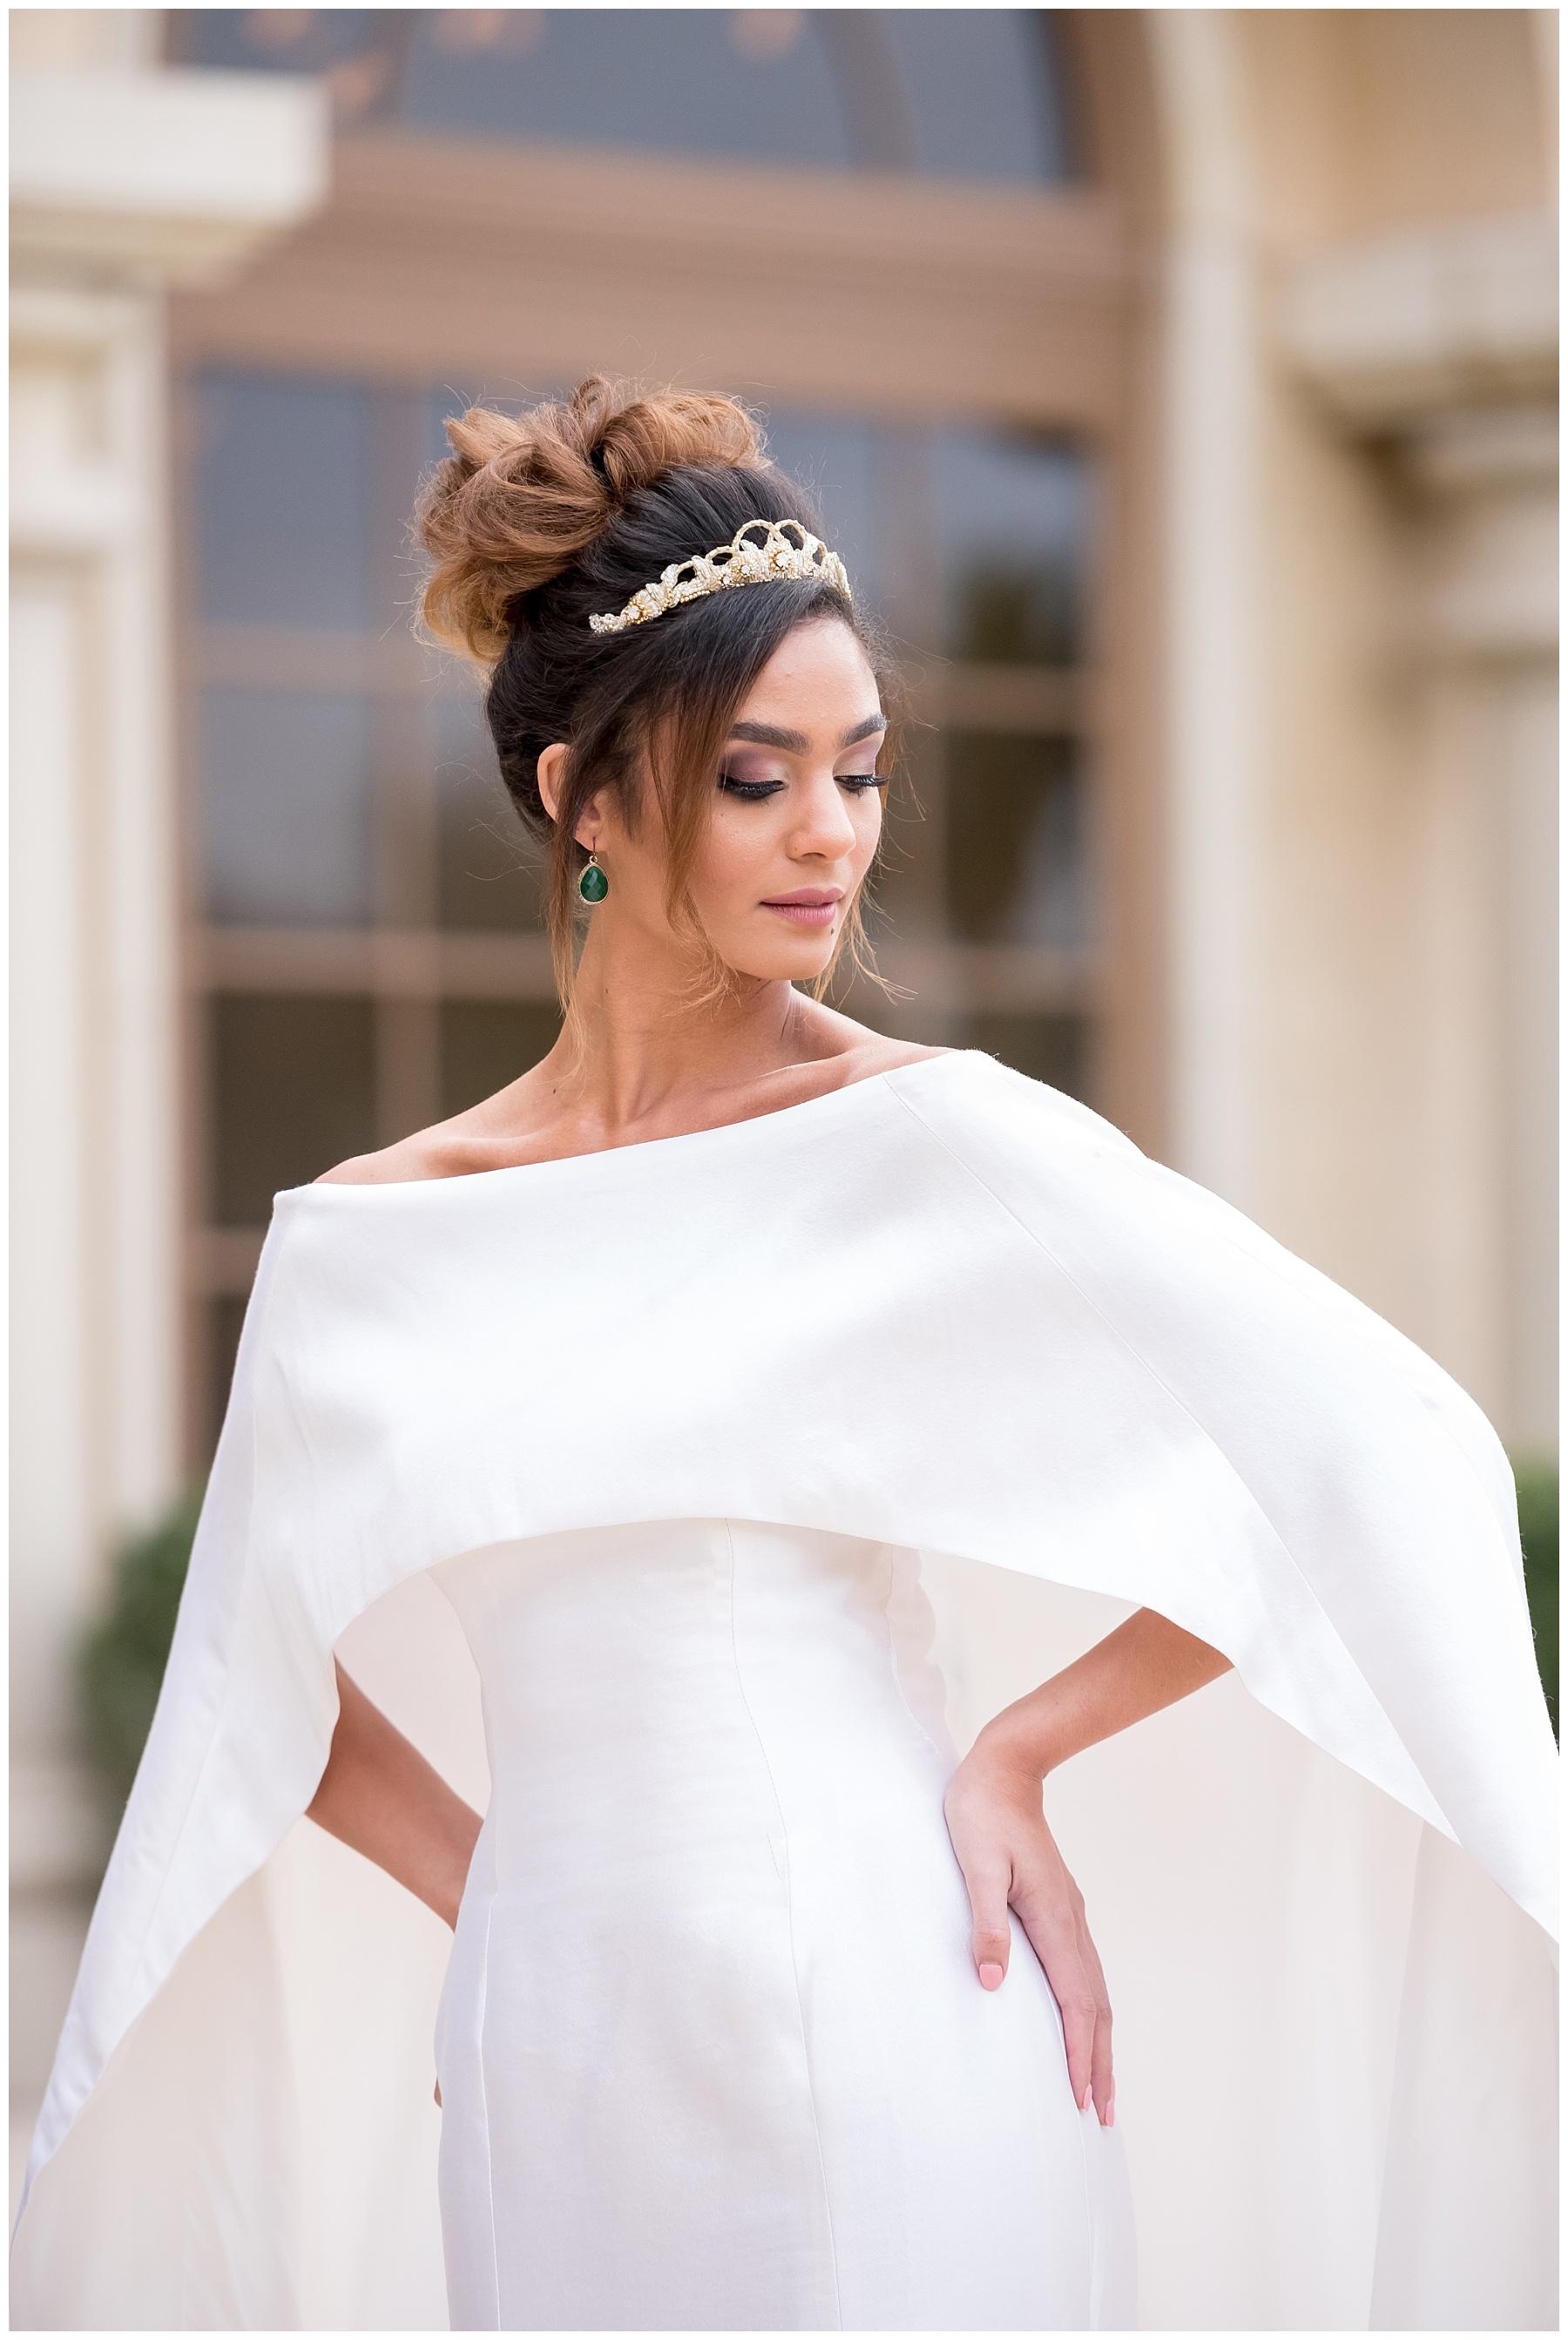 royal wedding hair and makeup las vegas (15).jpg